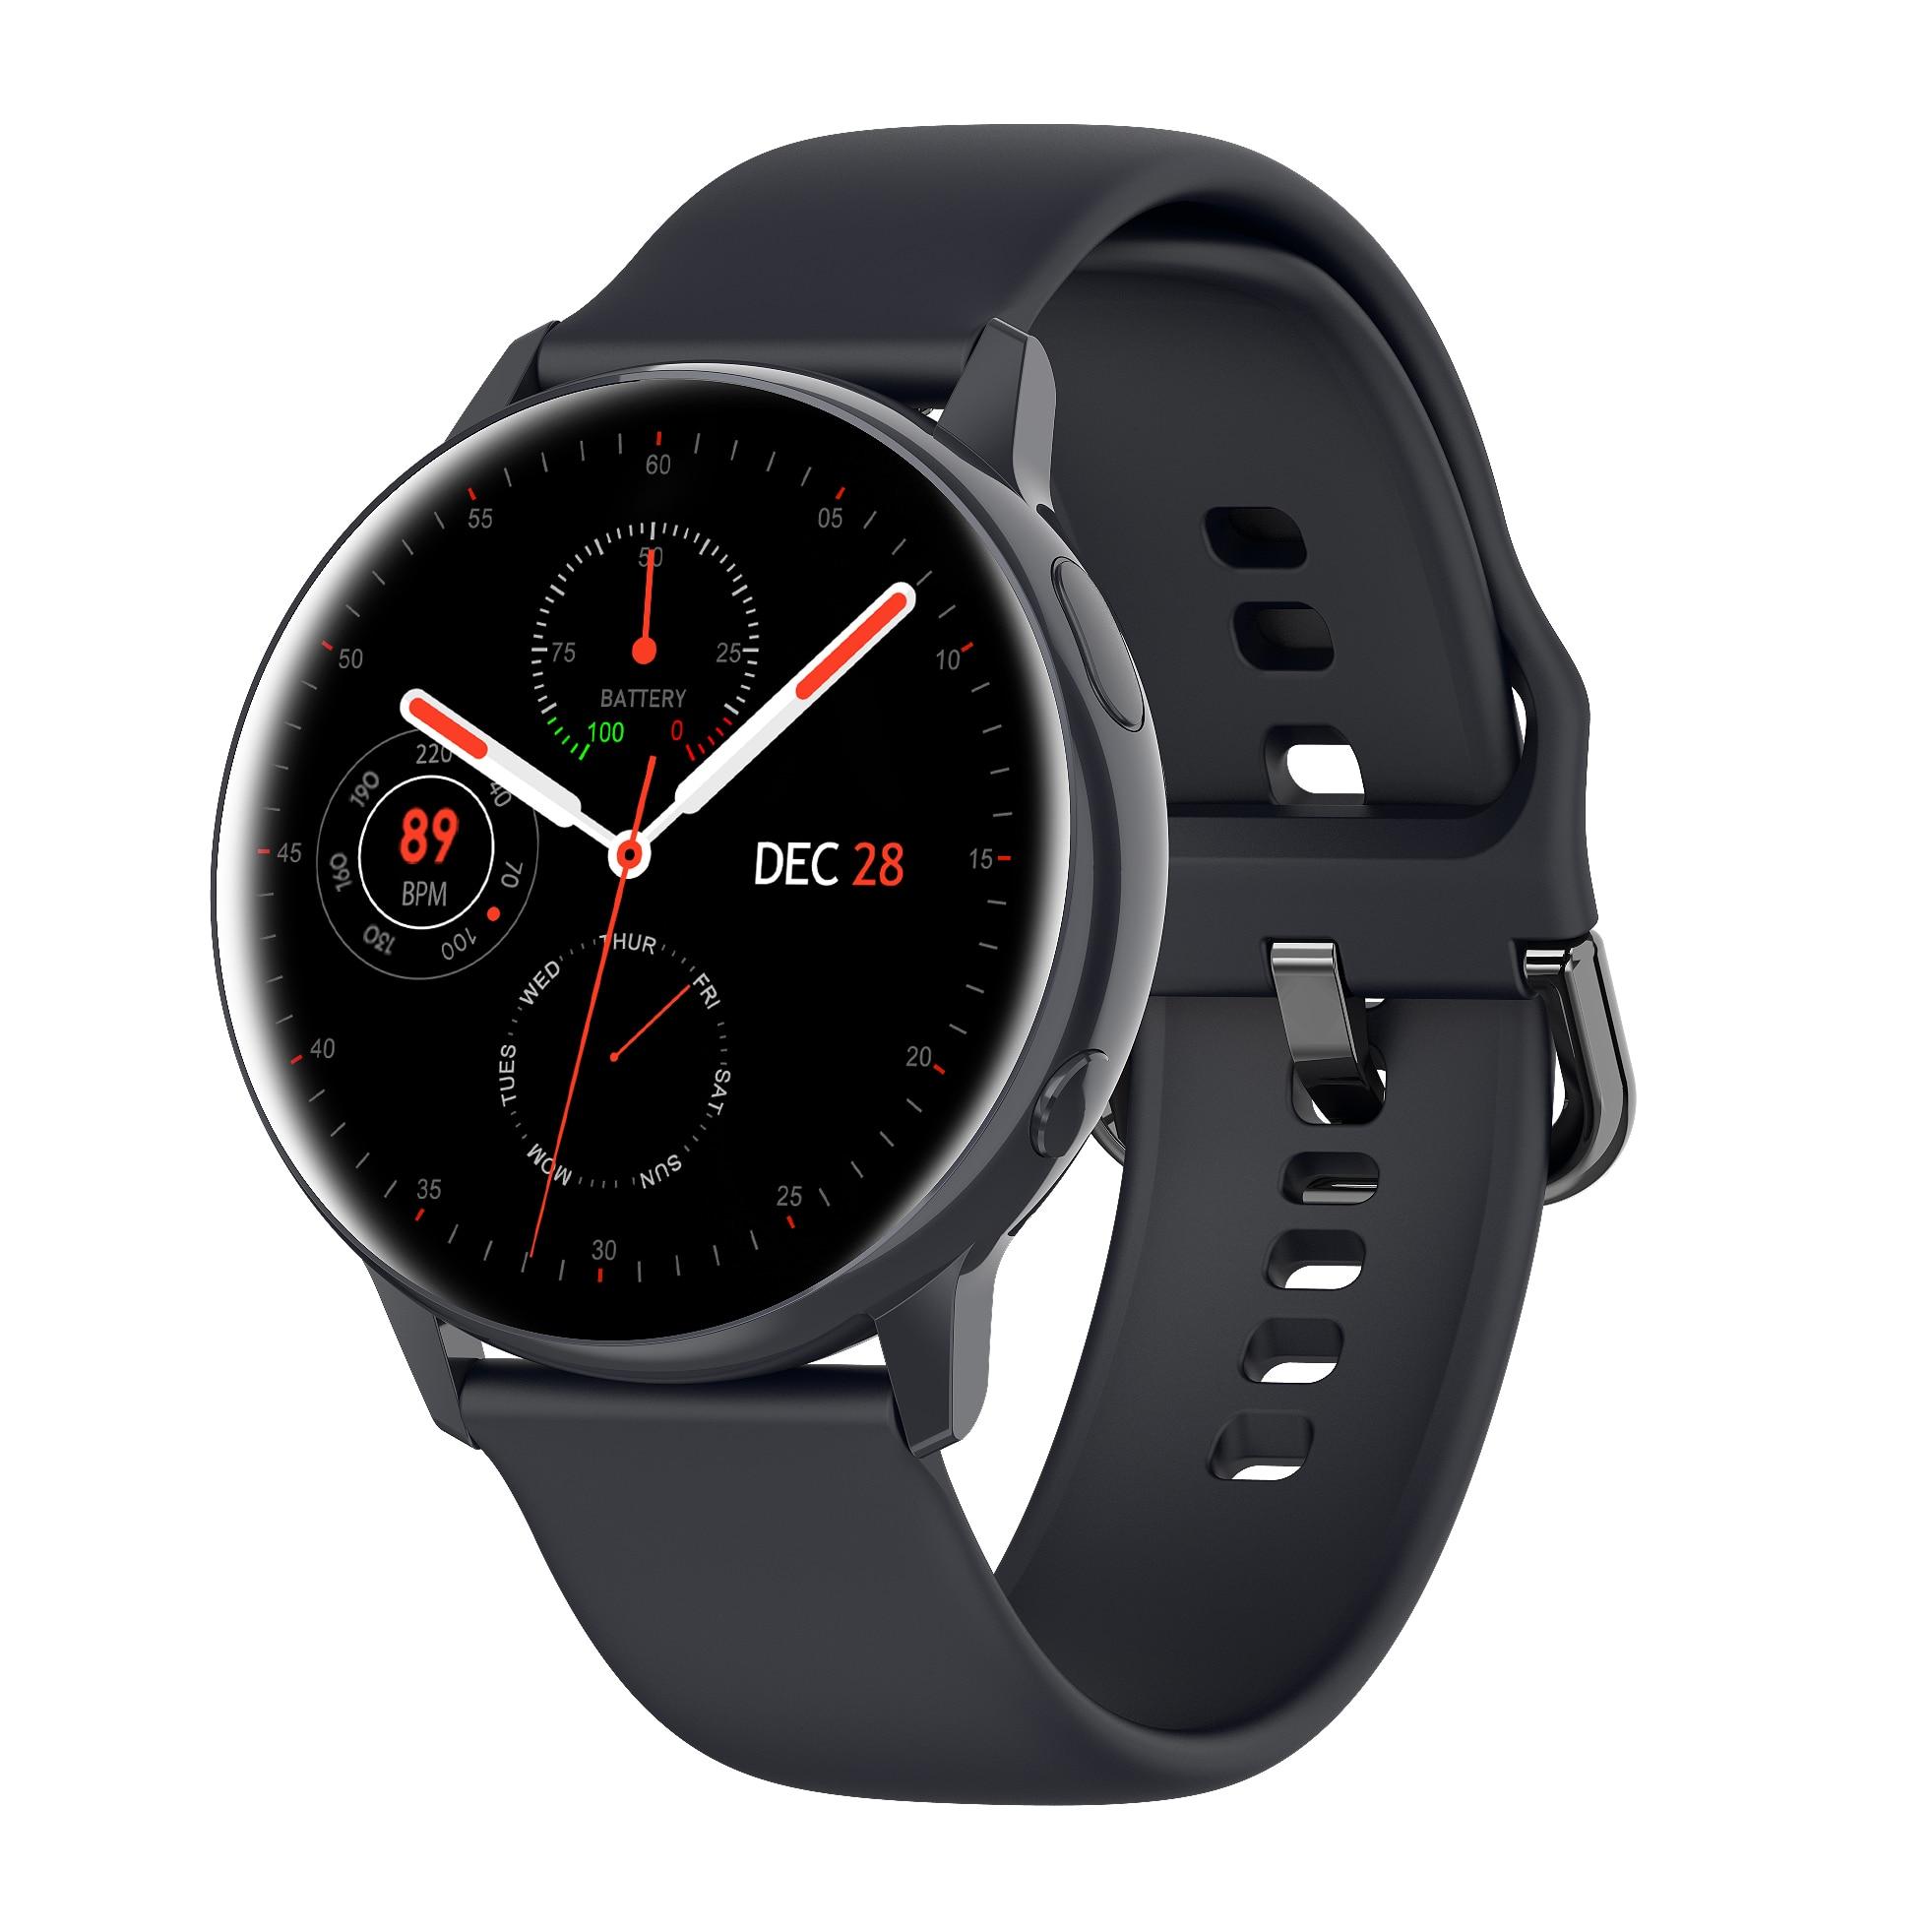 Permalink to APBLP SG2 390*390 HD Screen ECG  Wireless Charging Smart Watch Full Touch Smartwatch IP68 Waterproof Heart Rate Watches